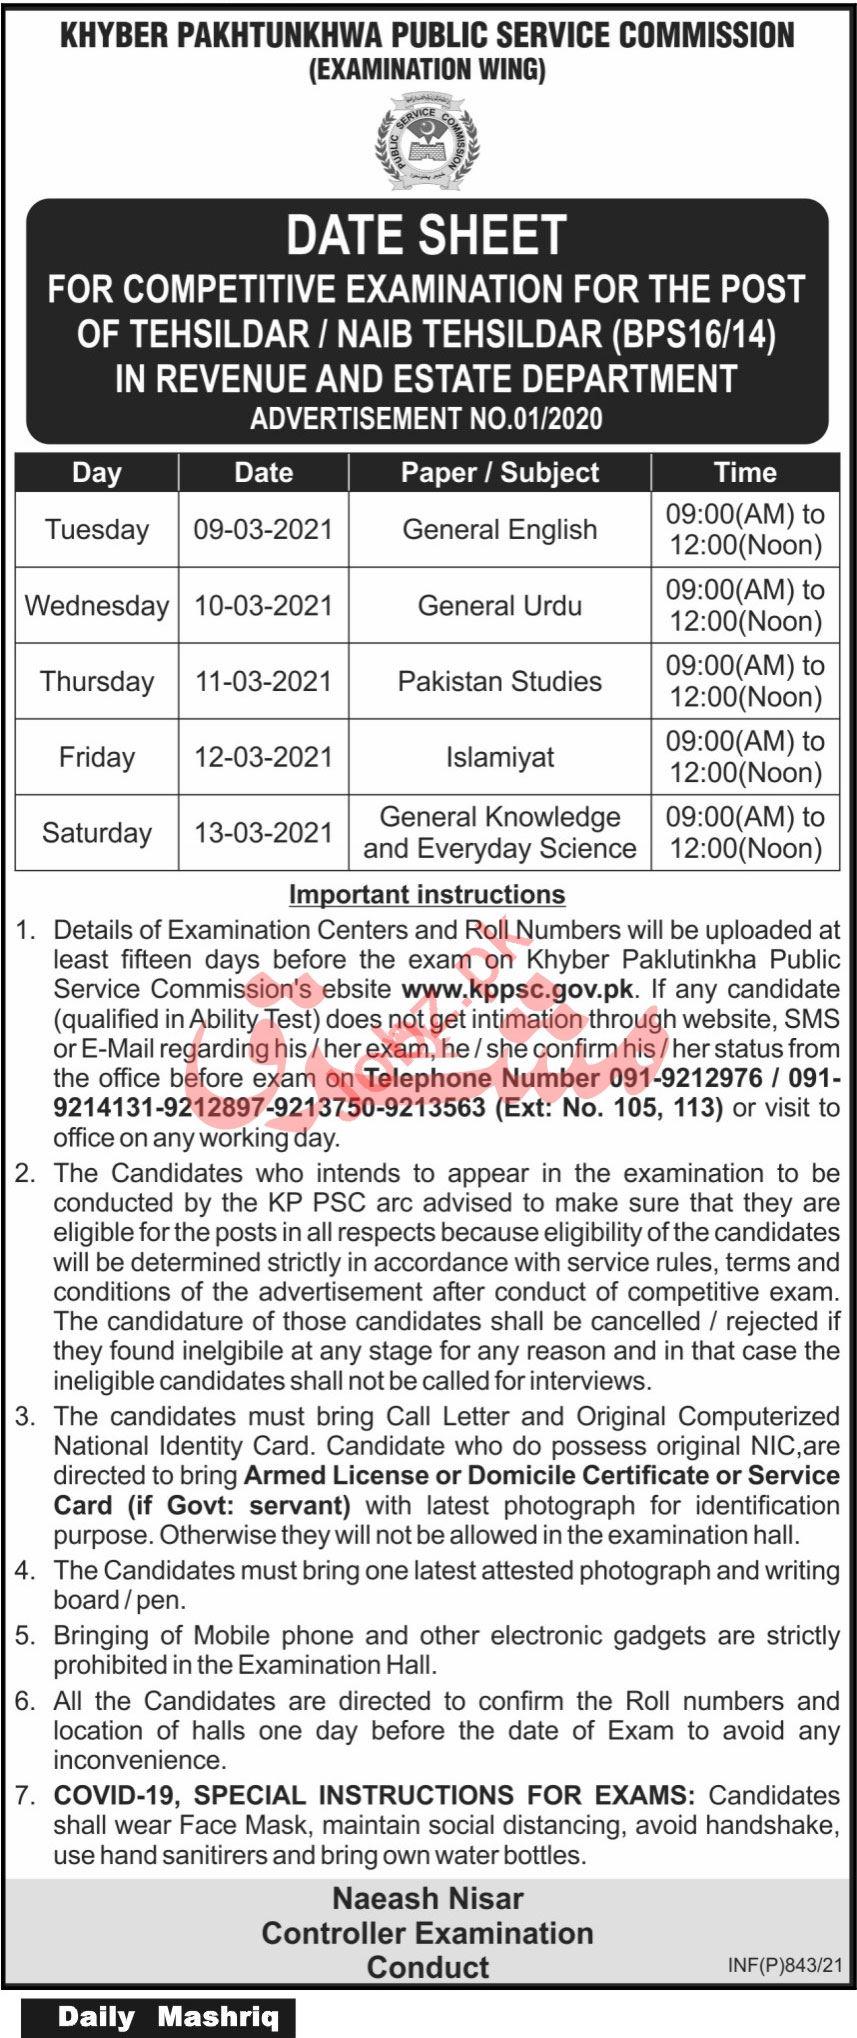 KPPSC Date Sheet 2021 for Tehsildar & Naib Tehsildar